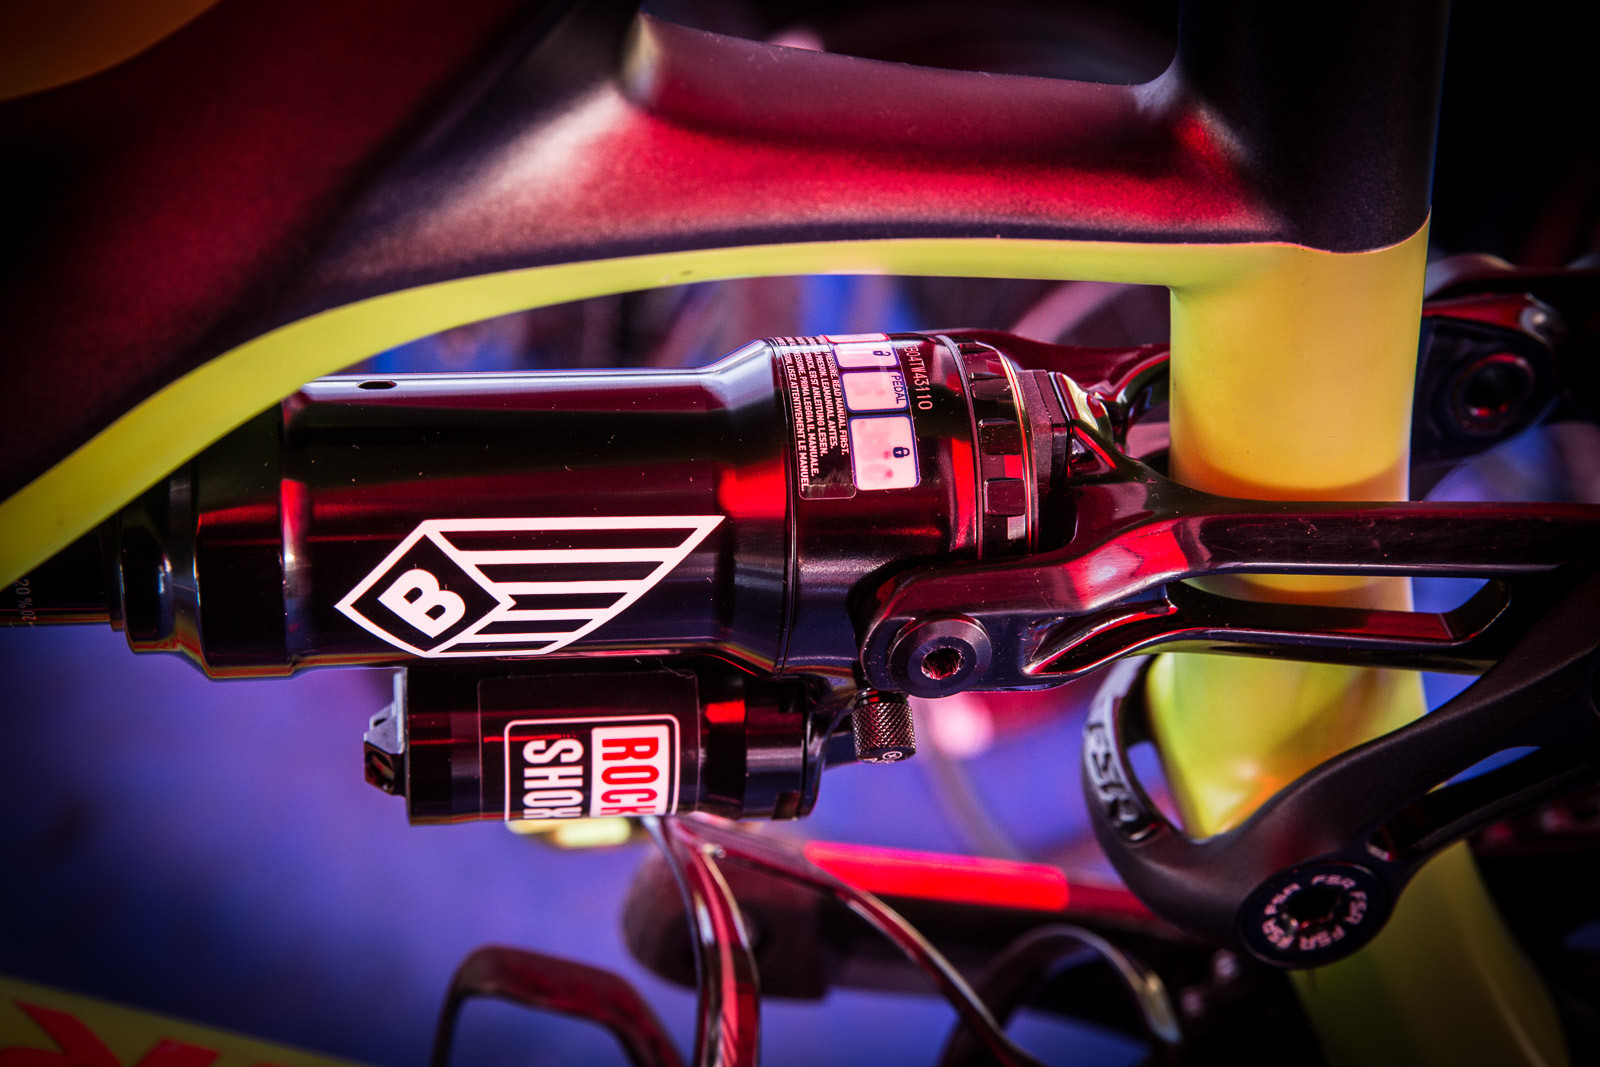 Jared Graves' BlackBox Rear Shock  - PIT BITS - Enduro World Series, Wicklow, Ireland - Mountain Biking Pictures - Vital MTB